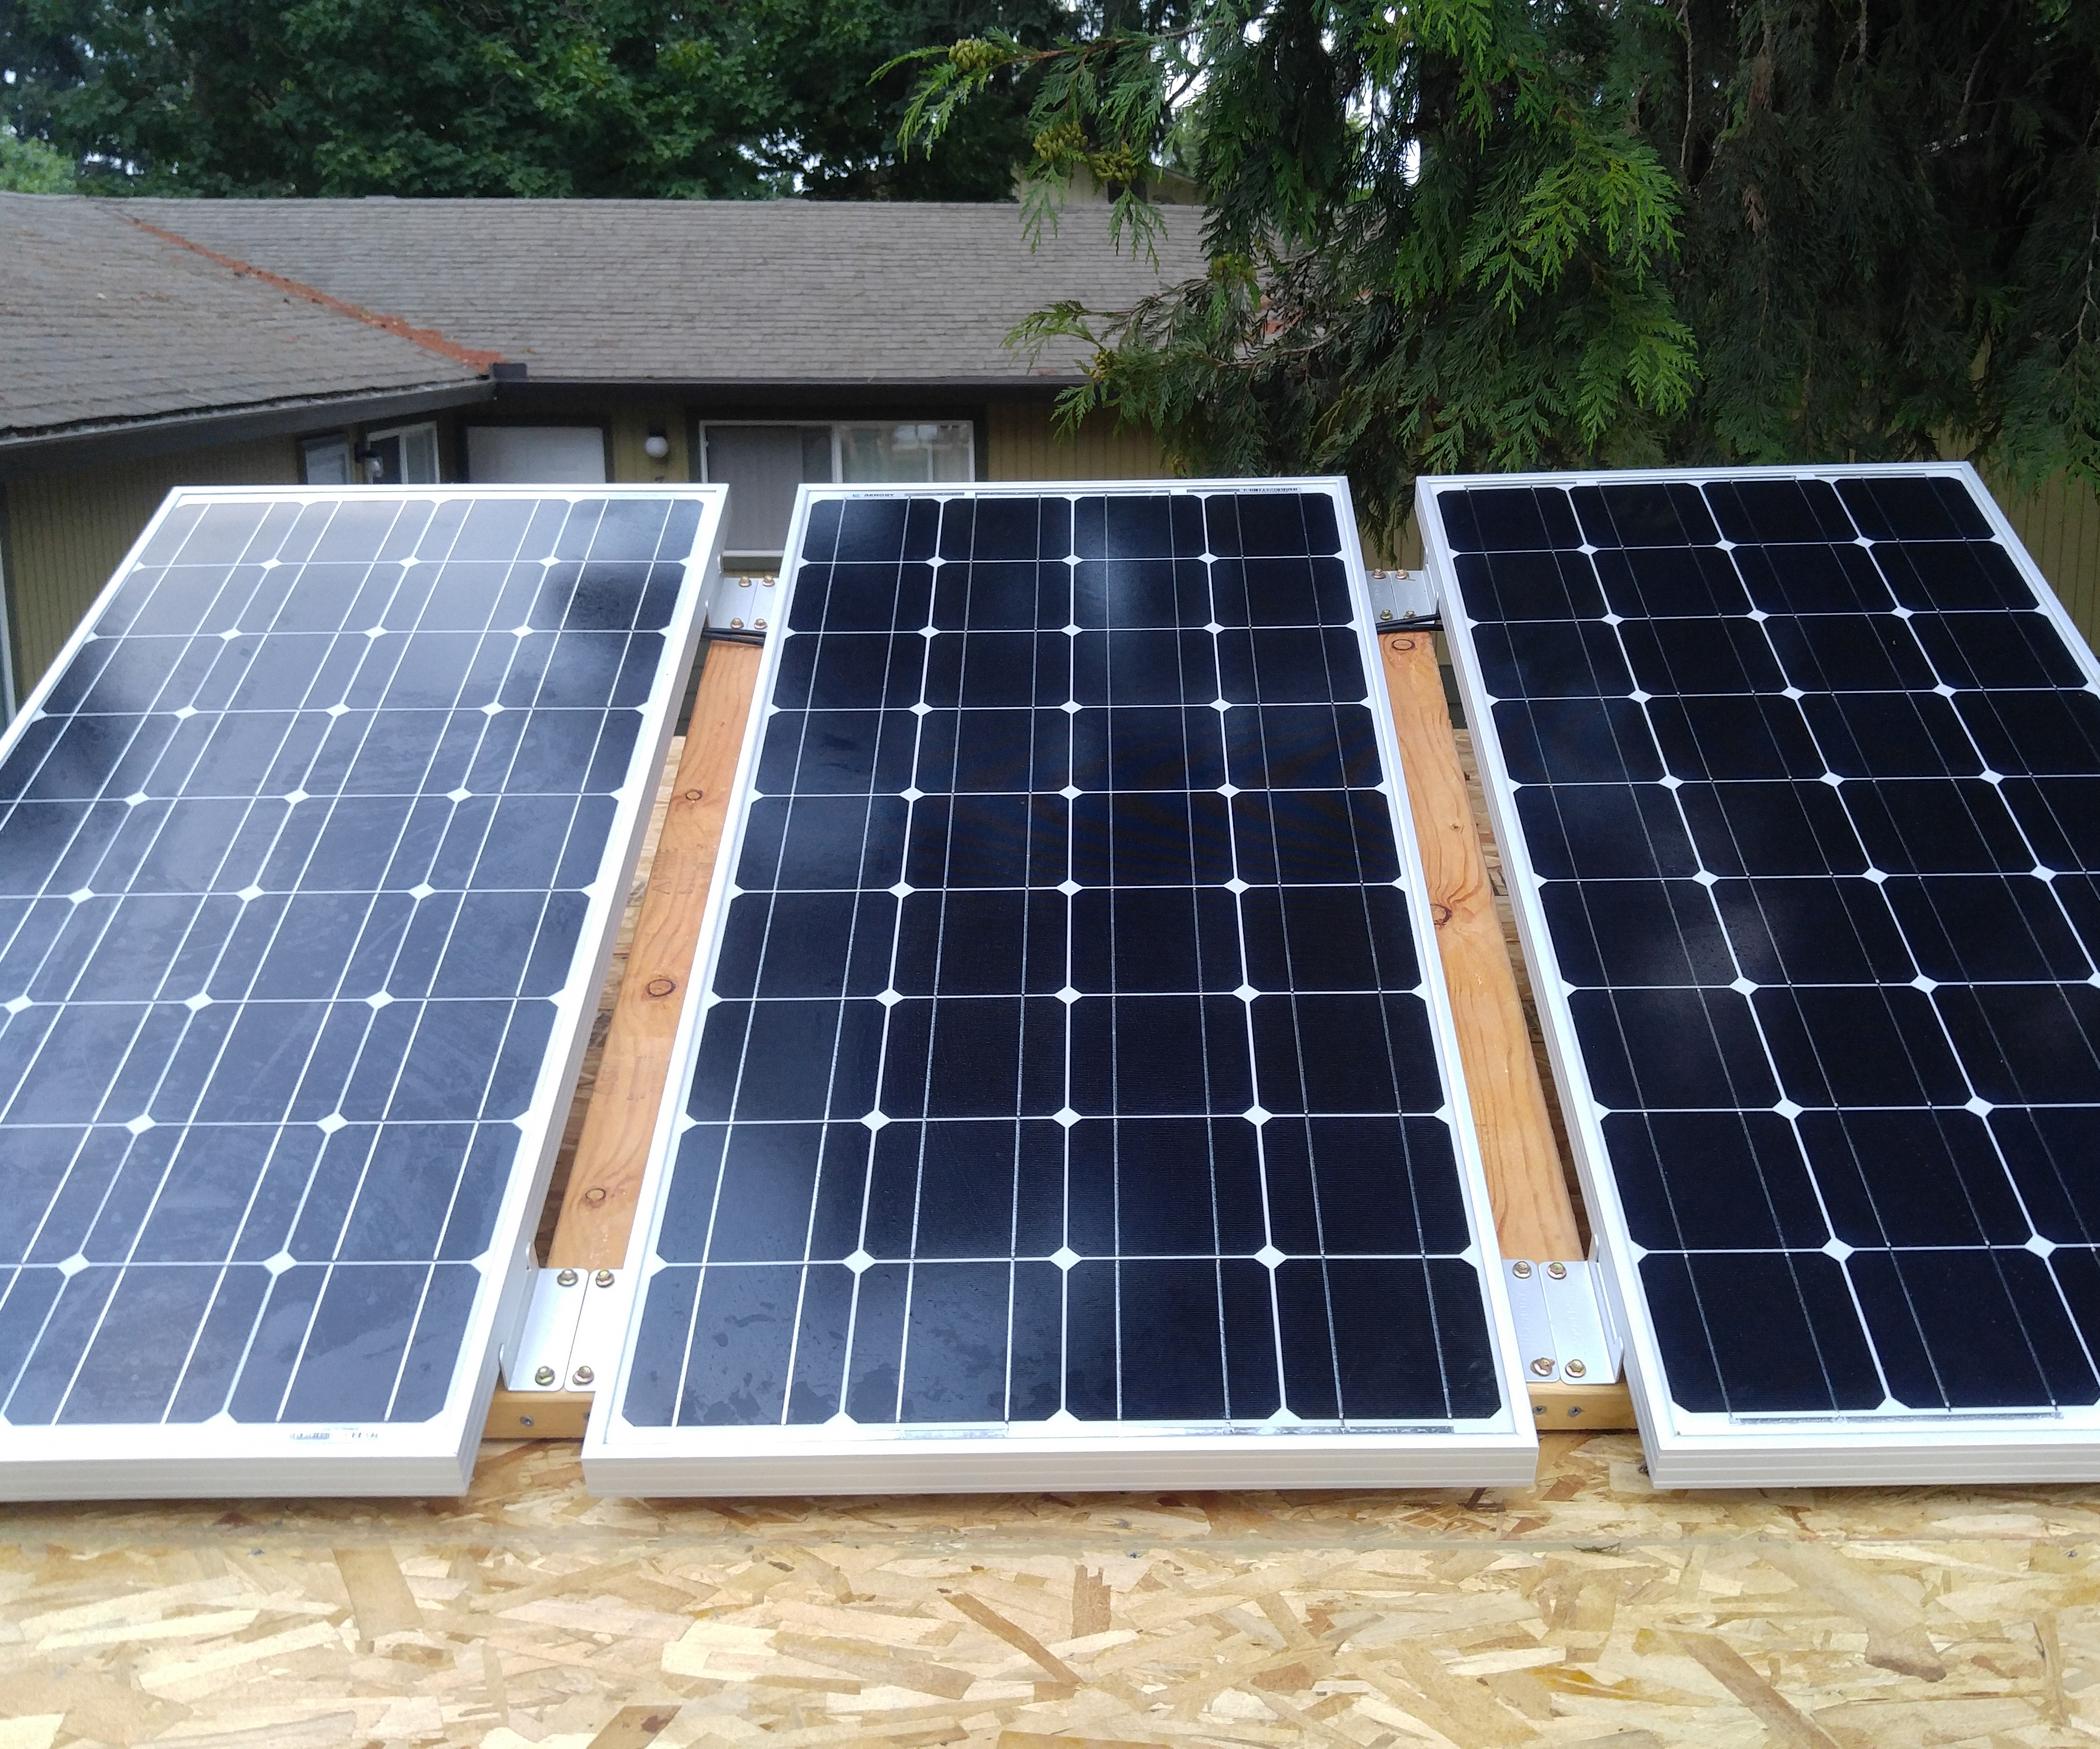 Solar Photovoltaic Pv Installation For Diy Camper Solar Panels Solar Energy Panels Best Solar Panels